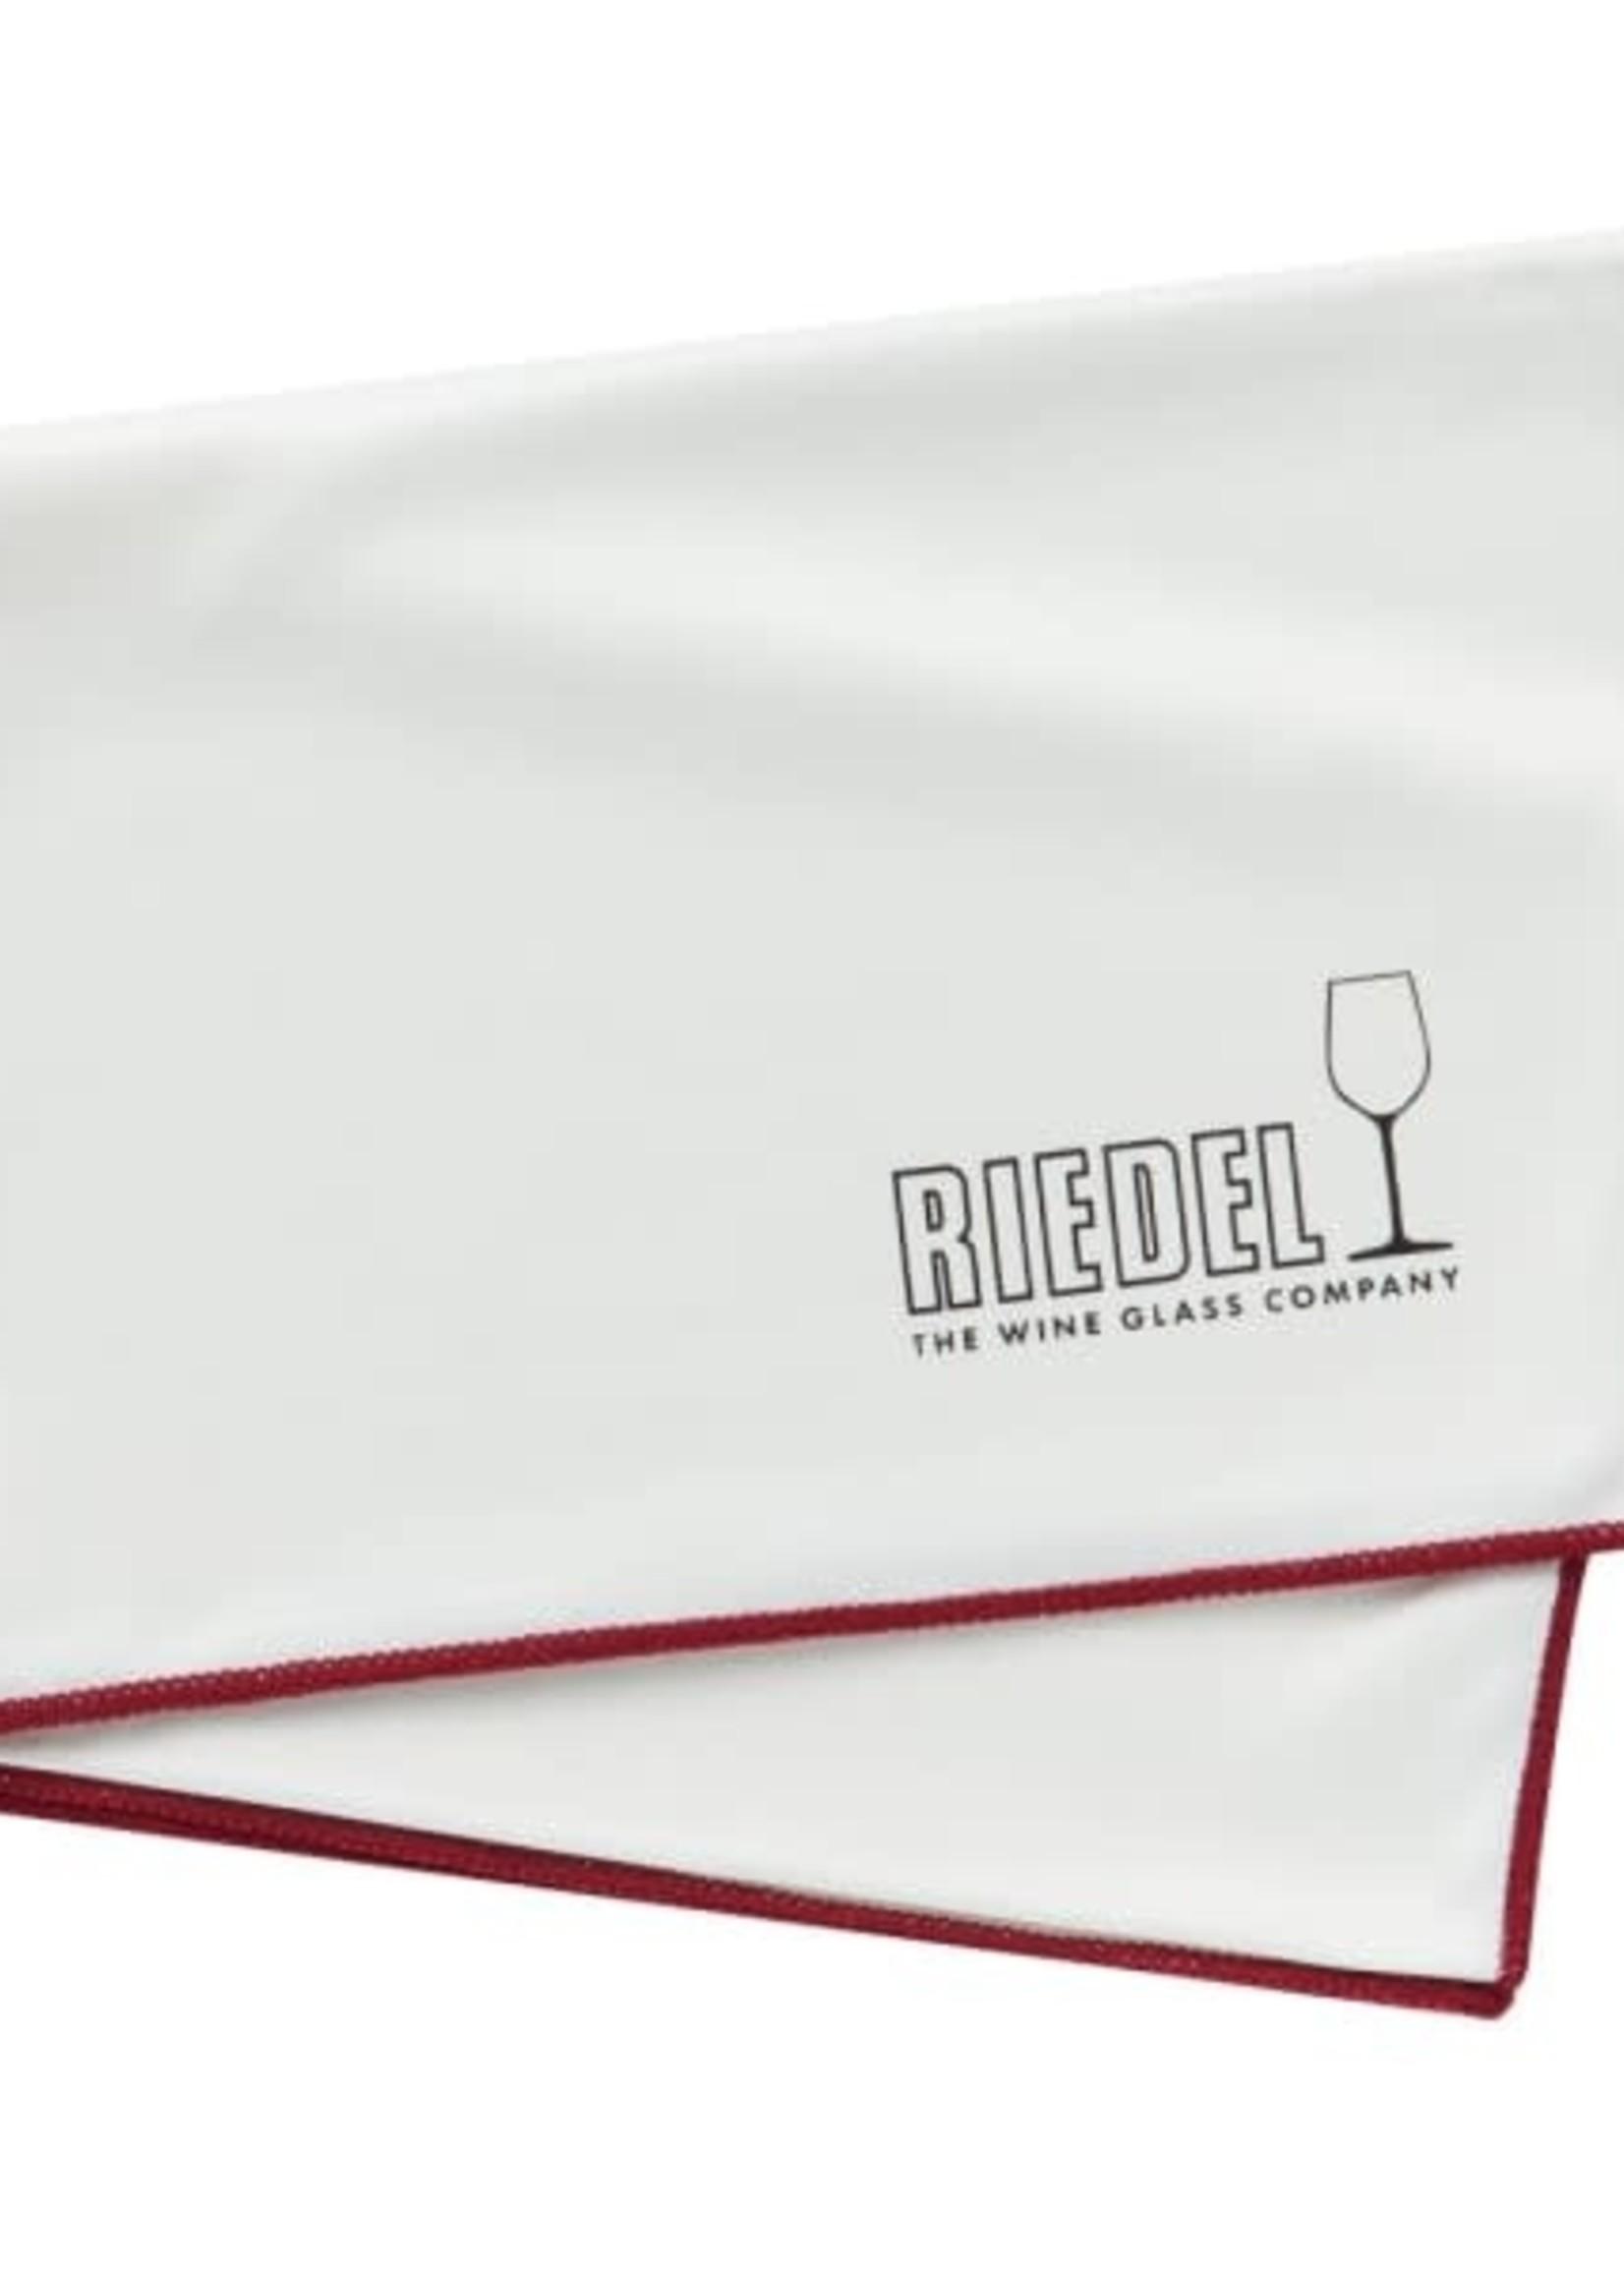 Riedel Riedel Accessories Polishing Cloths